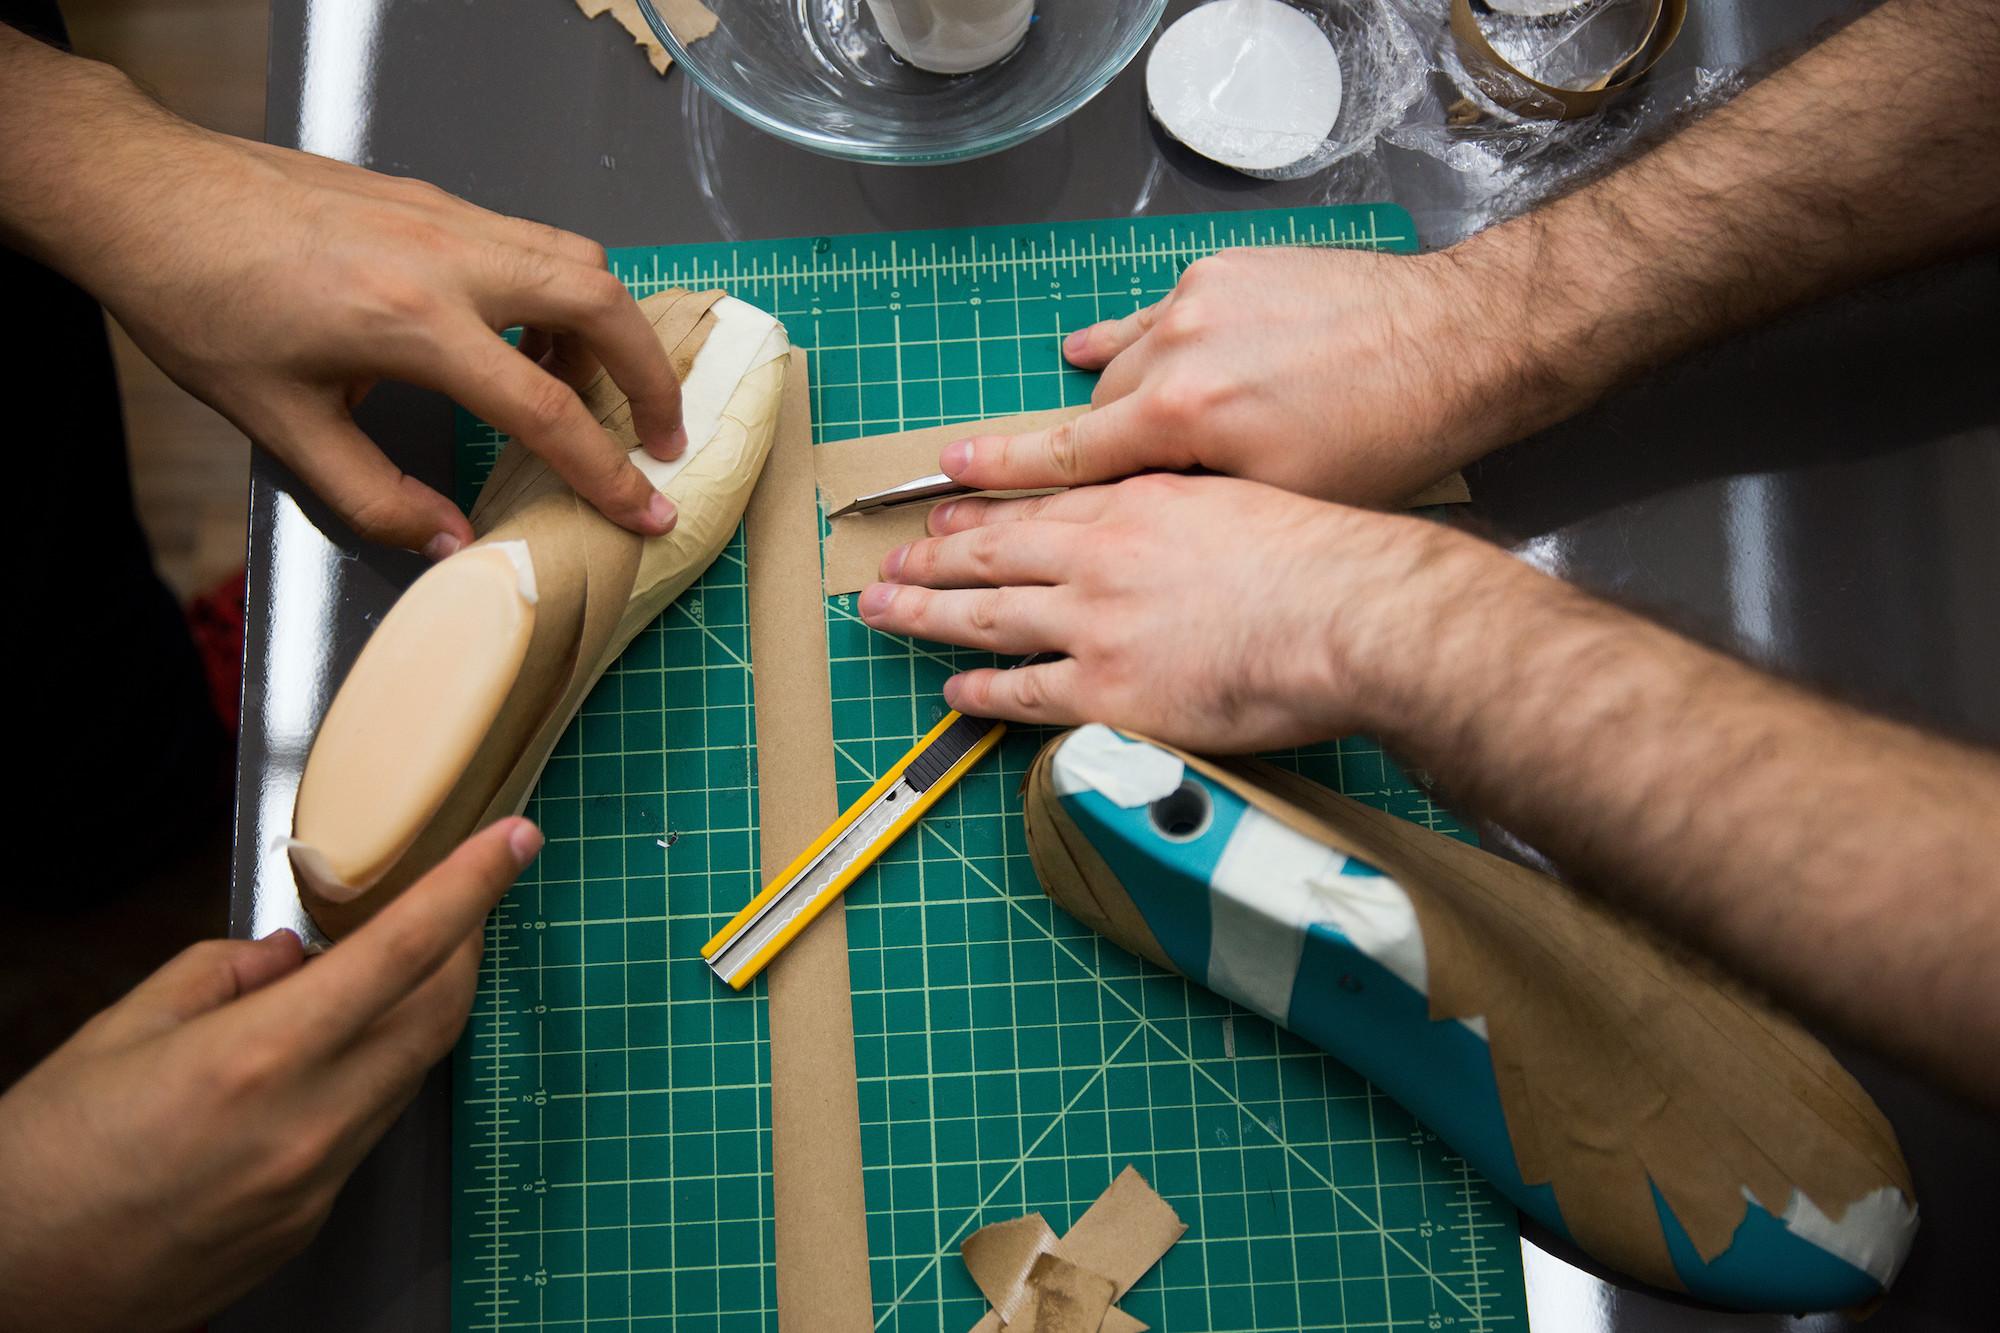 pensole Kolding School of Design 8